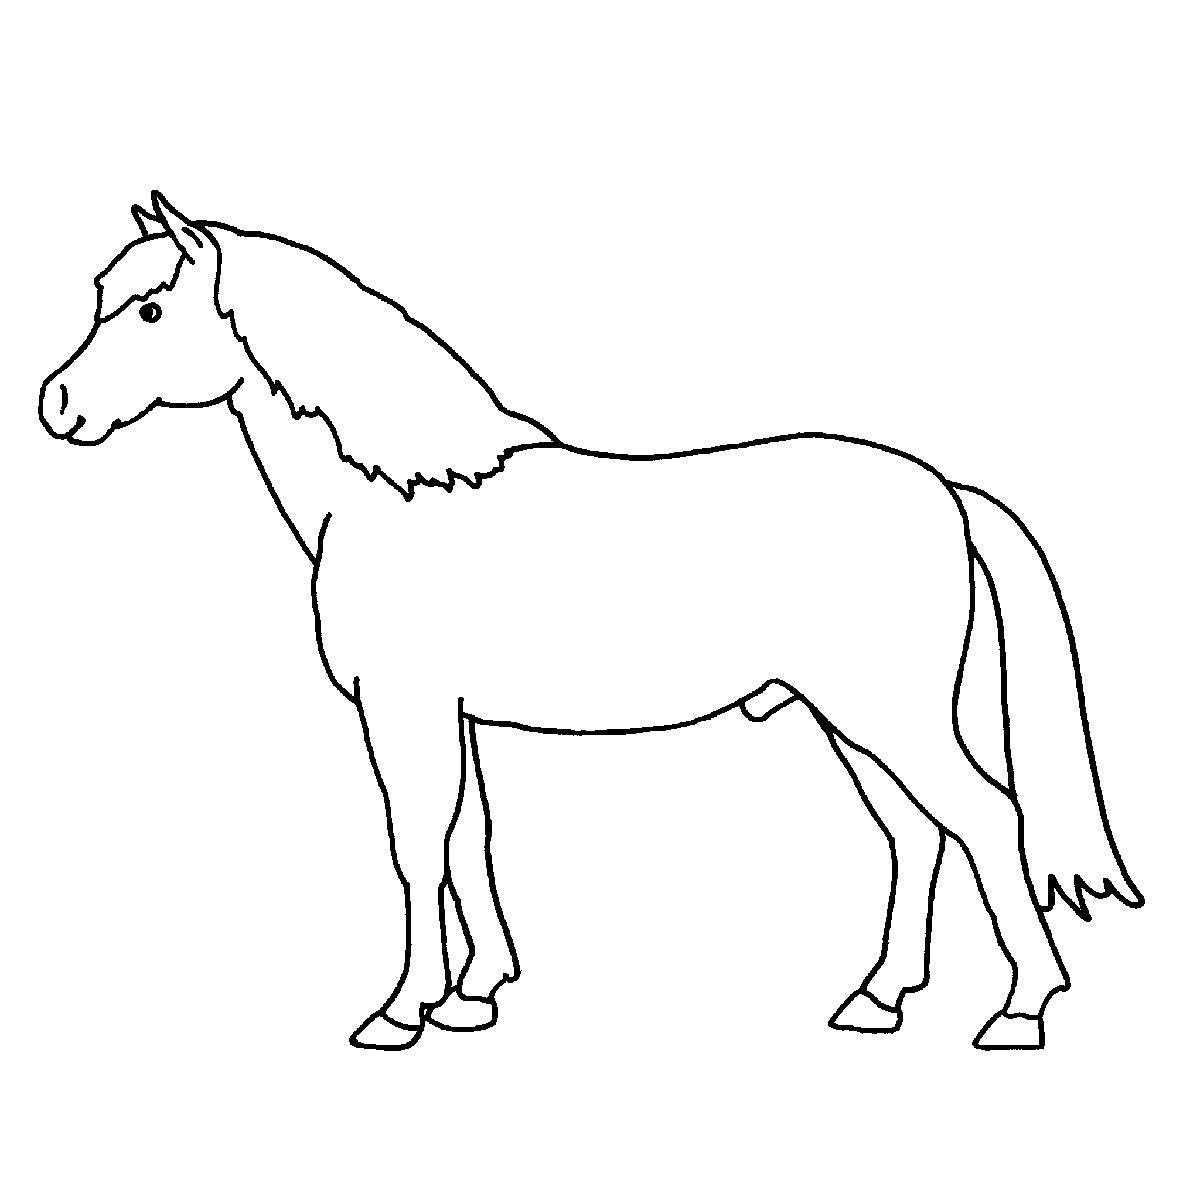 Ausmalbild Bauernhof: Ausmalbild Pferd Kostenlos Ausdrucken innen Ausmalbilder Bauernhof Kostenlos